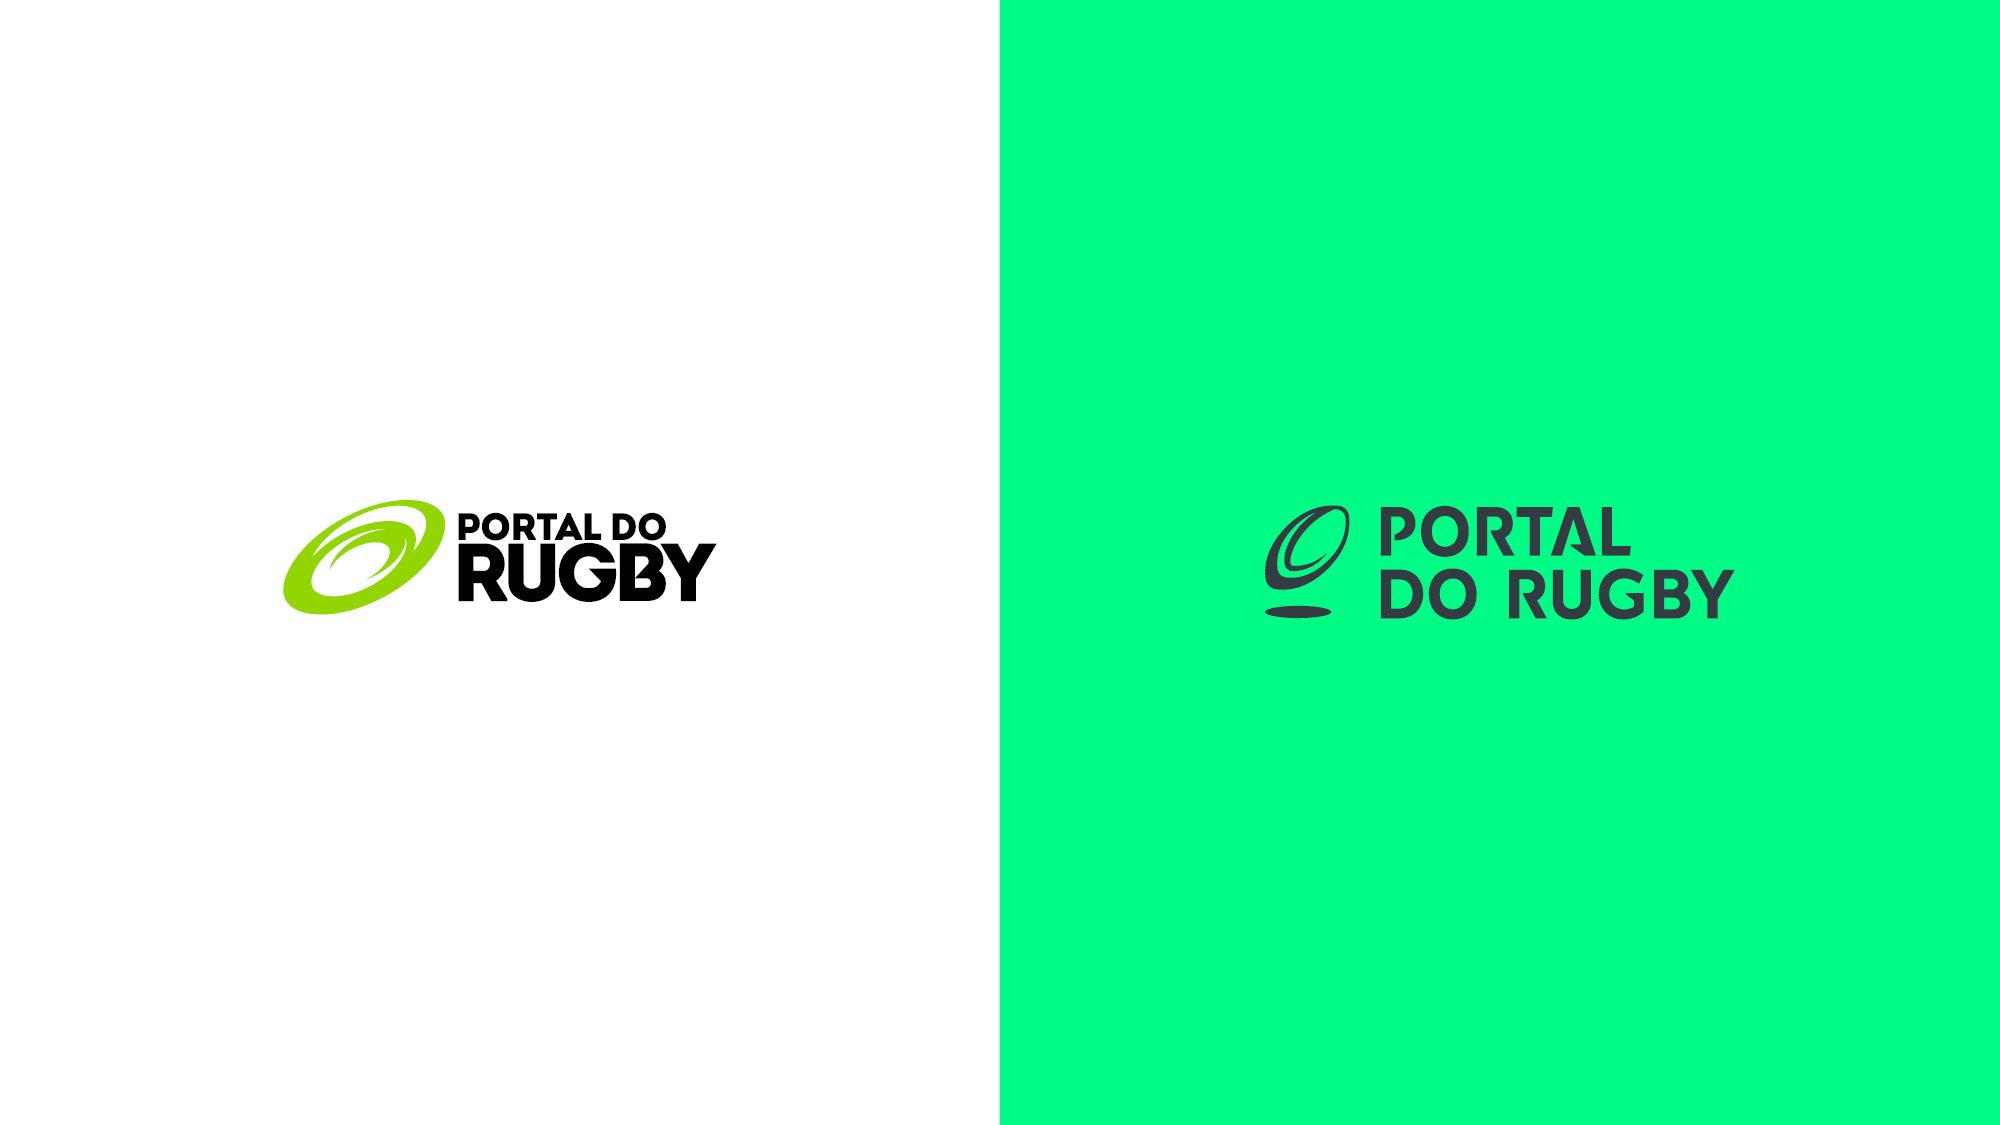 Nacione-Branding-Portal-do-Rugby28